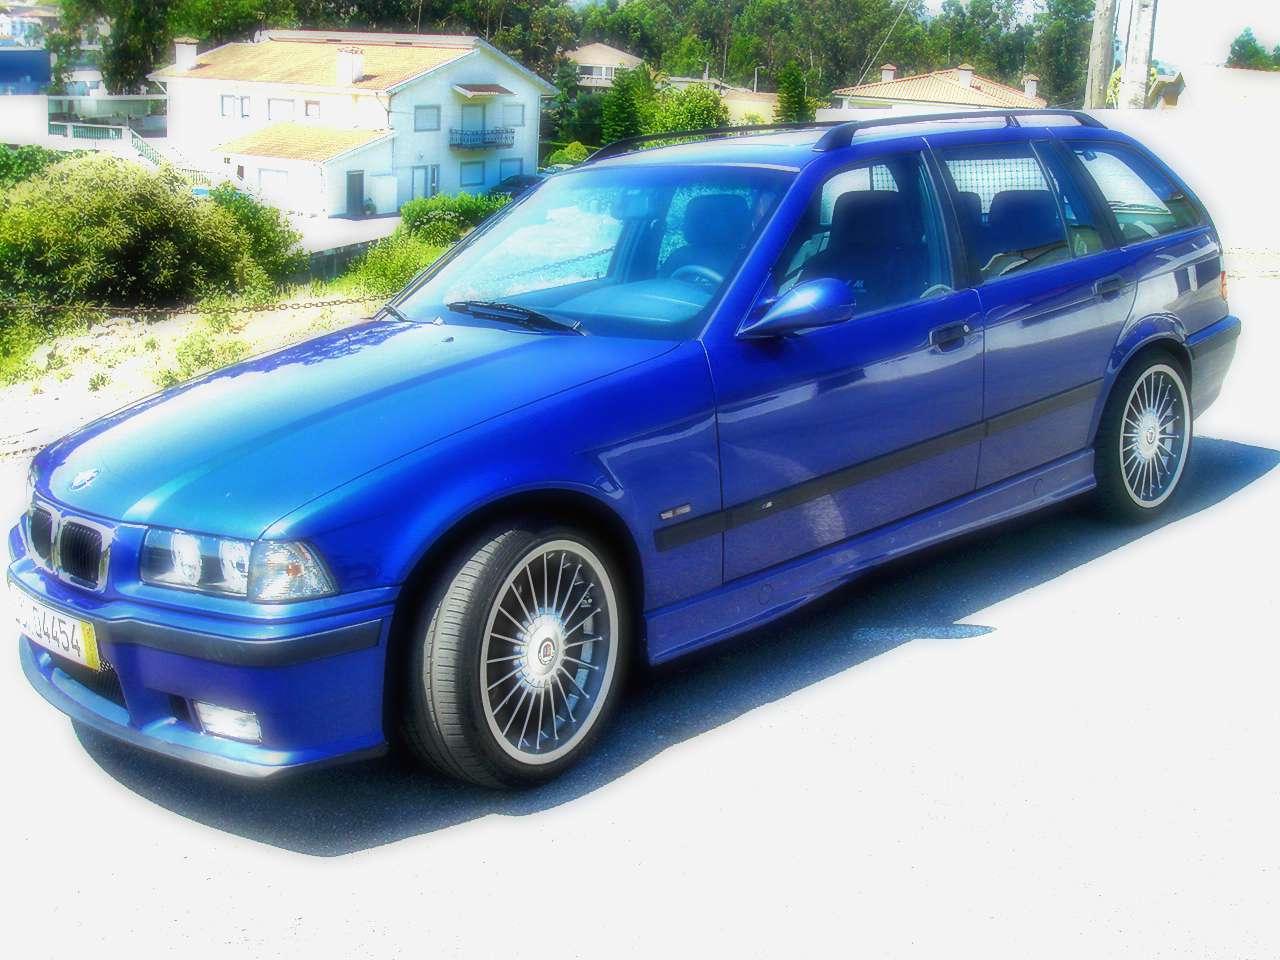 NEW !! NEW !! BMW E36 ESTATE TOURING ROOF SPOILER !!